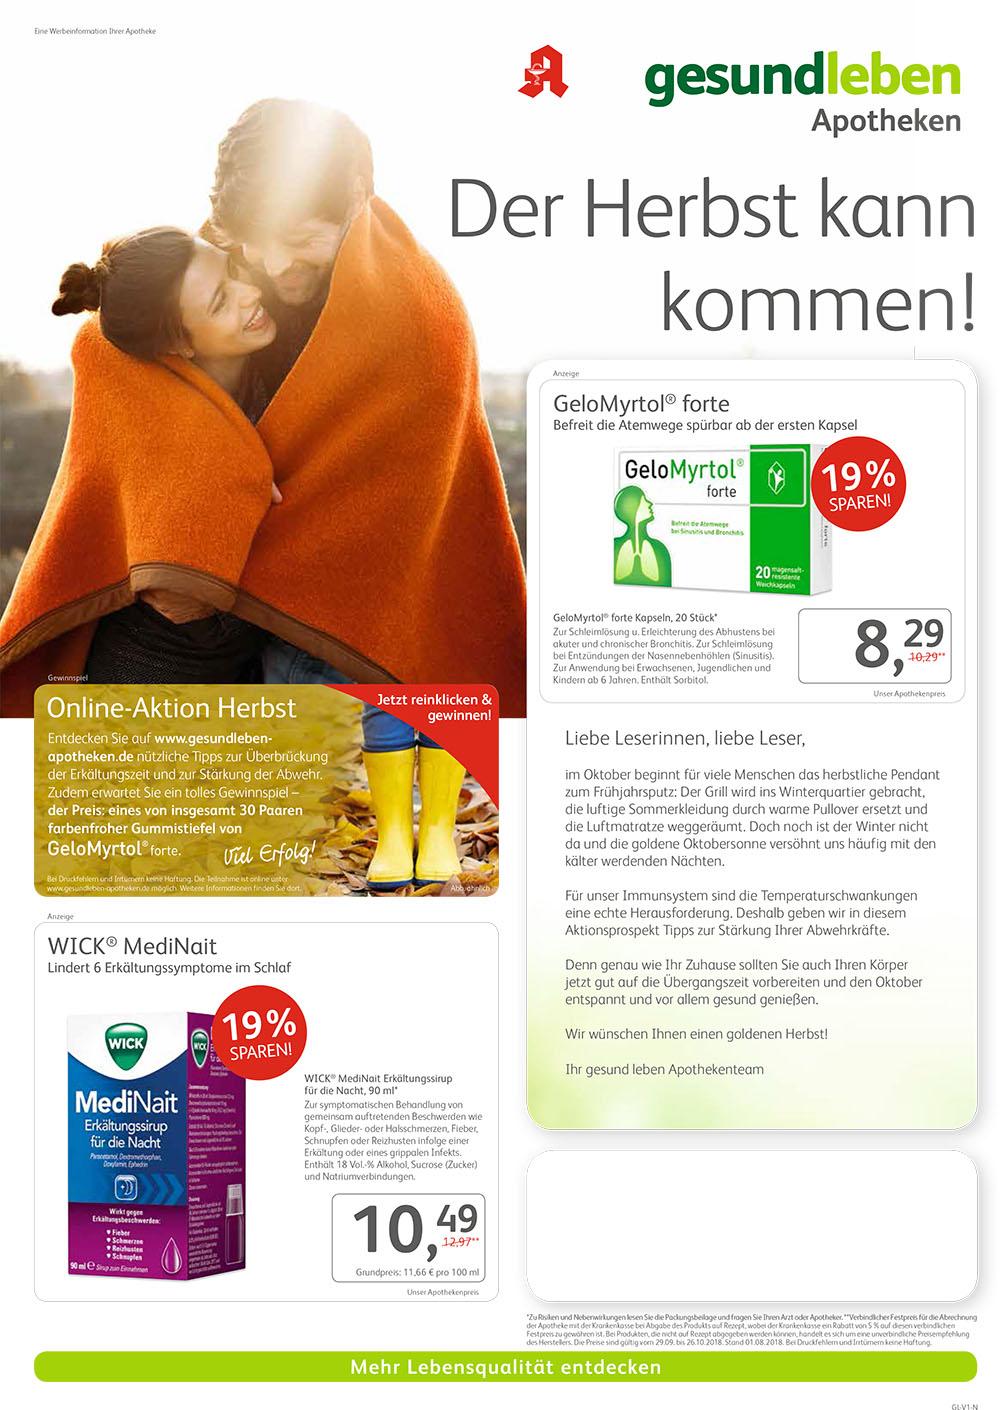 http://www.apotheken.de/fileadmin/clubarea/00000-Angebote/51103_vital_angebot_1.jpg